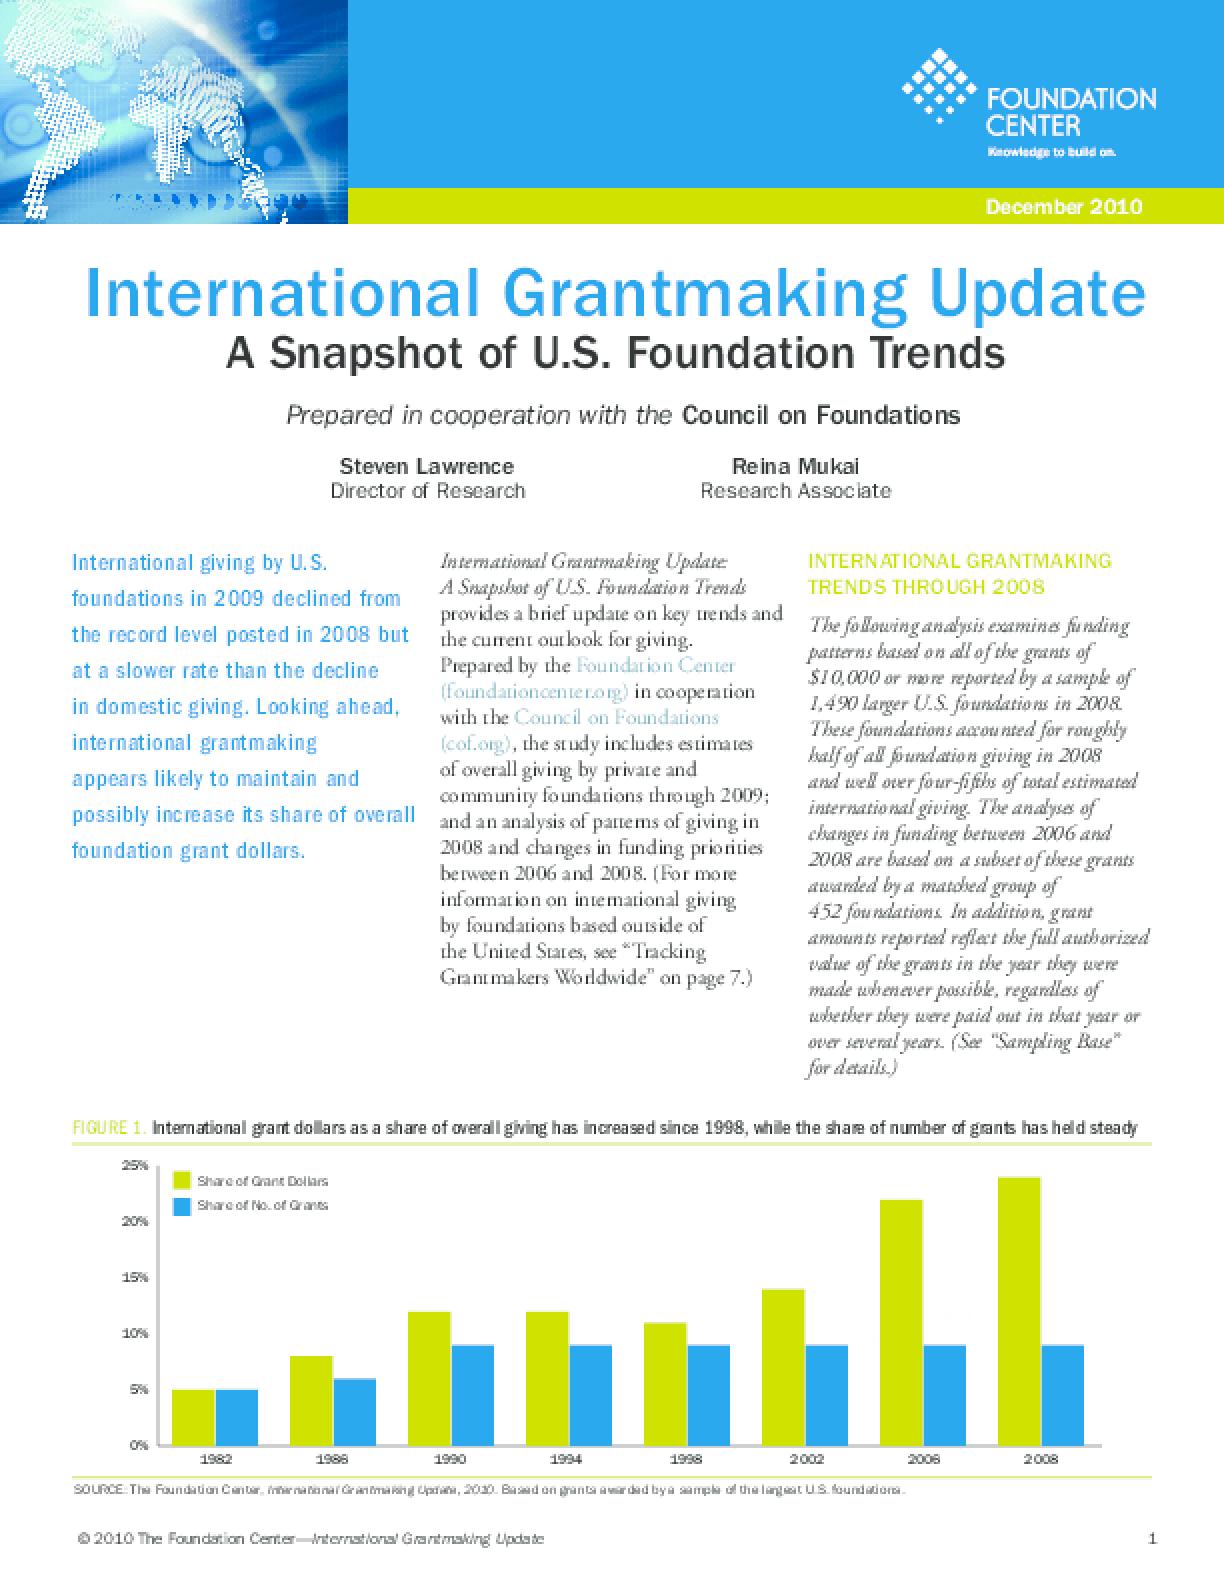 International Grantmaking Update: A Snapshot of U.S. Foundation Trends